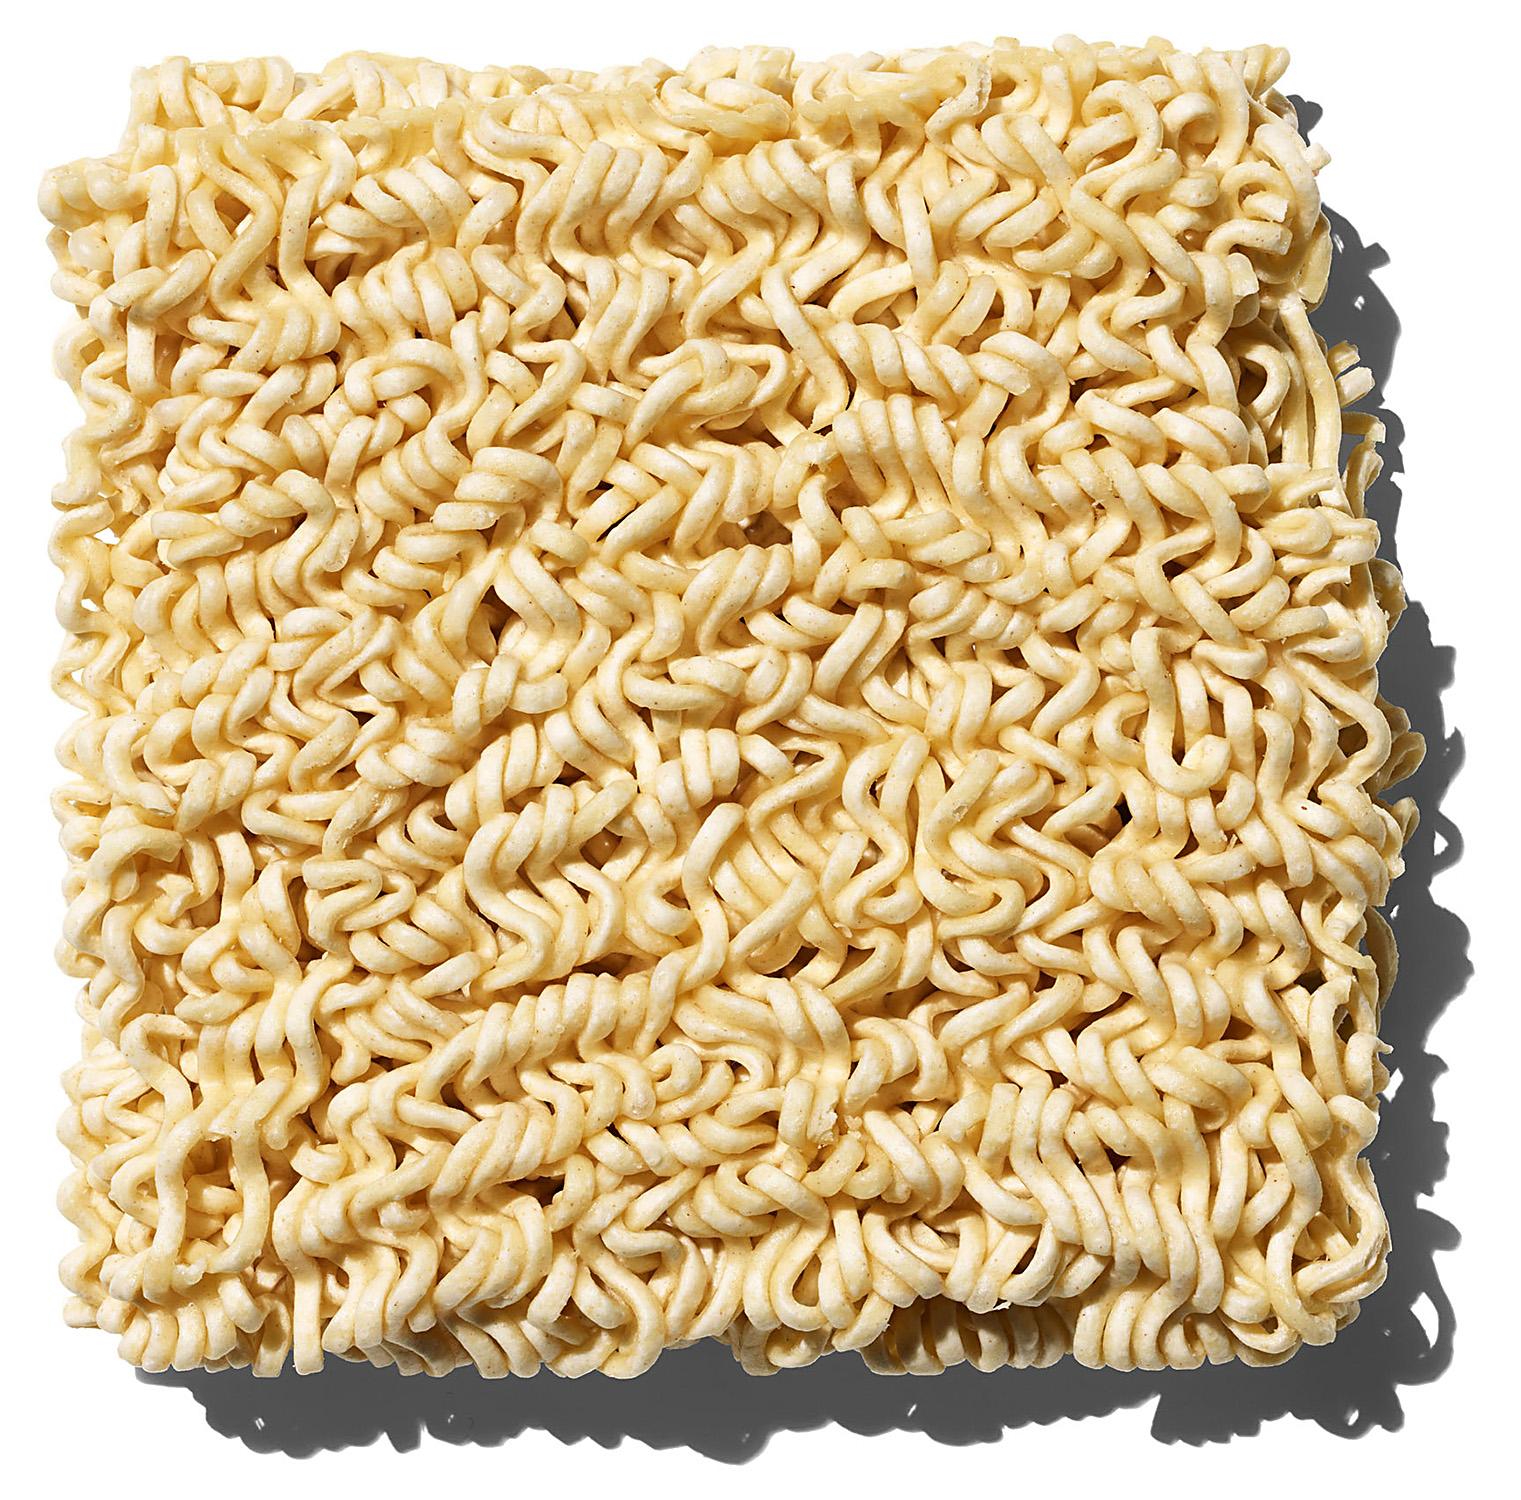 block of Ramen noodles